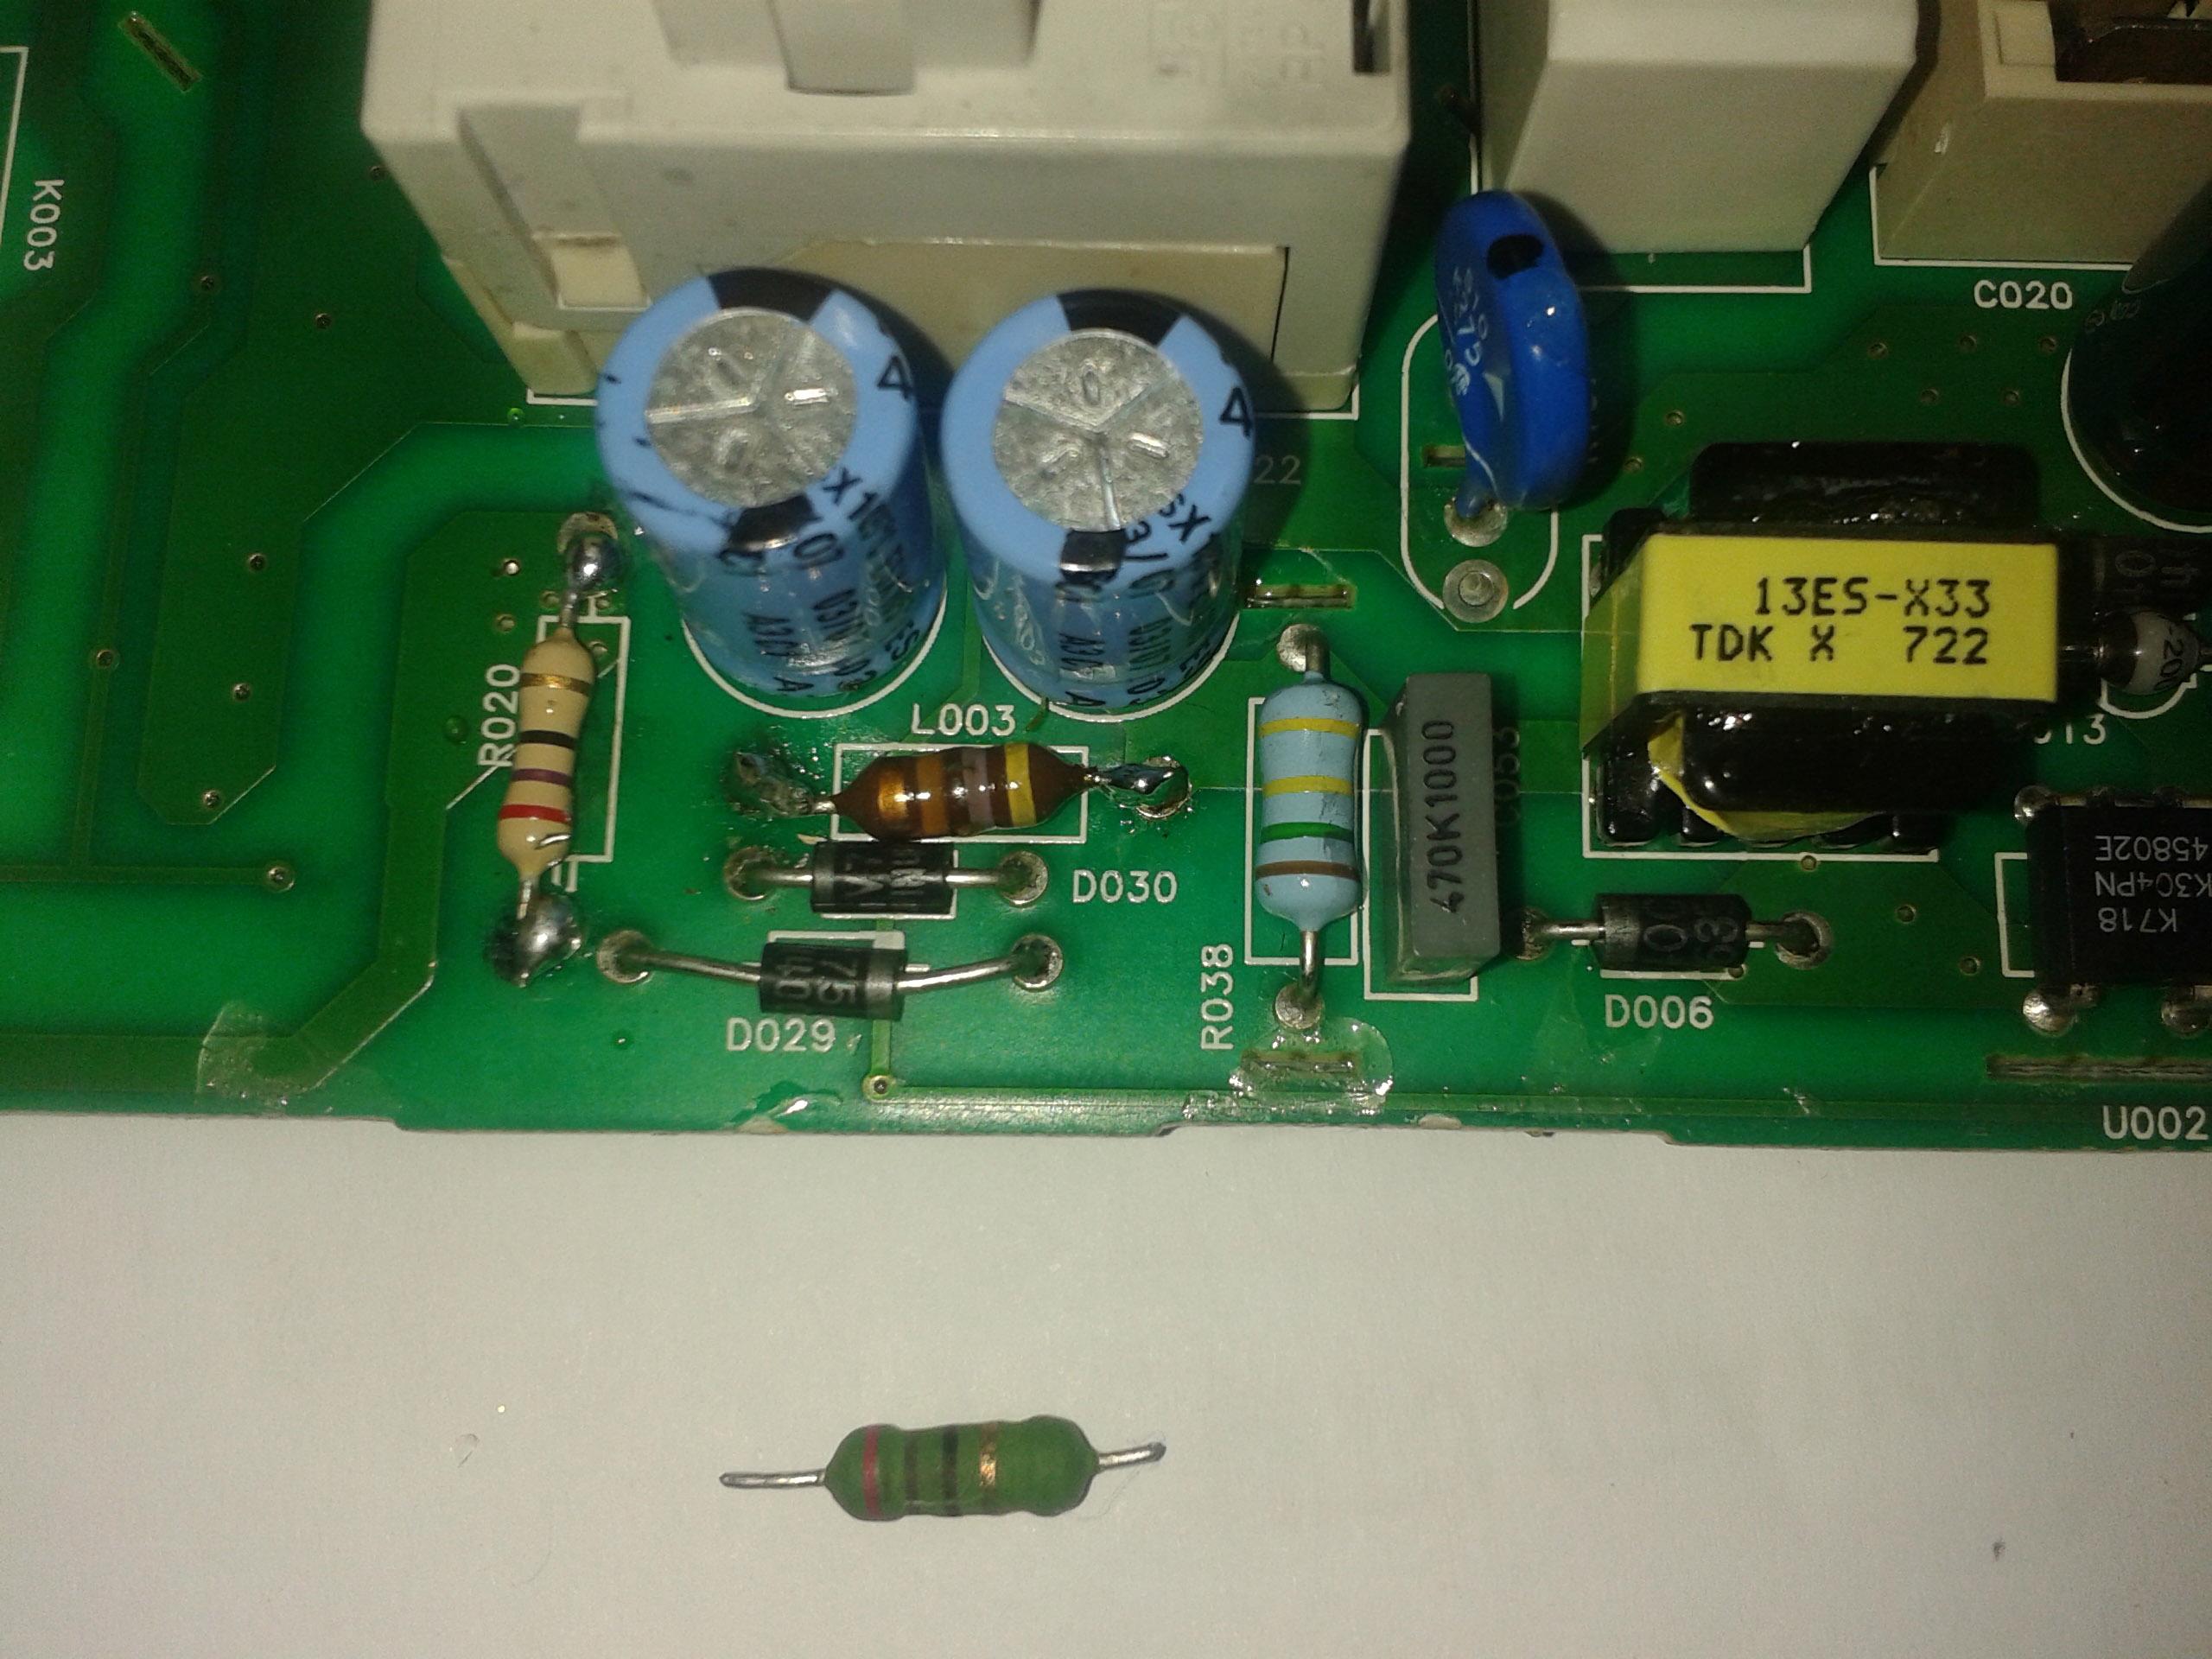 Schema Elettrico Scheda Whirlpool L1799 : Grix forum scheda lavatrice chi mi aiuta su